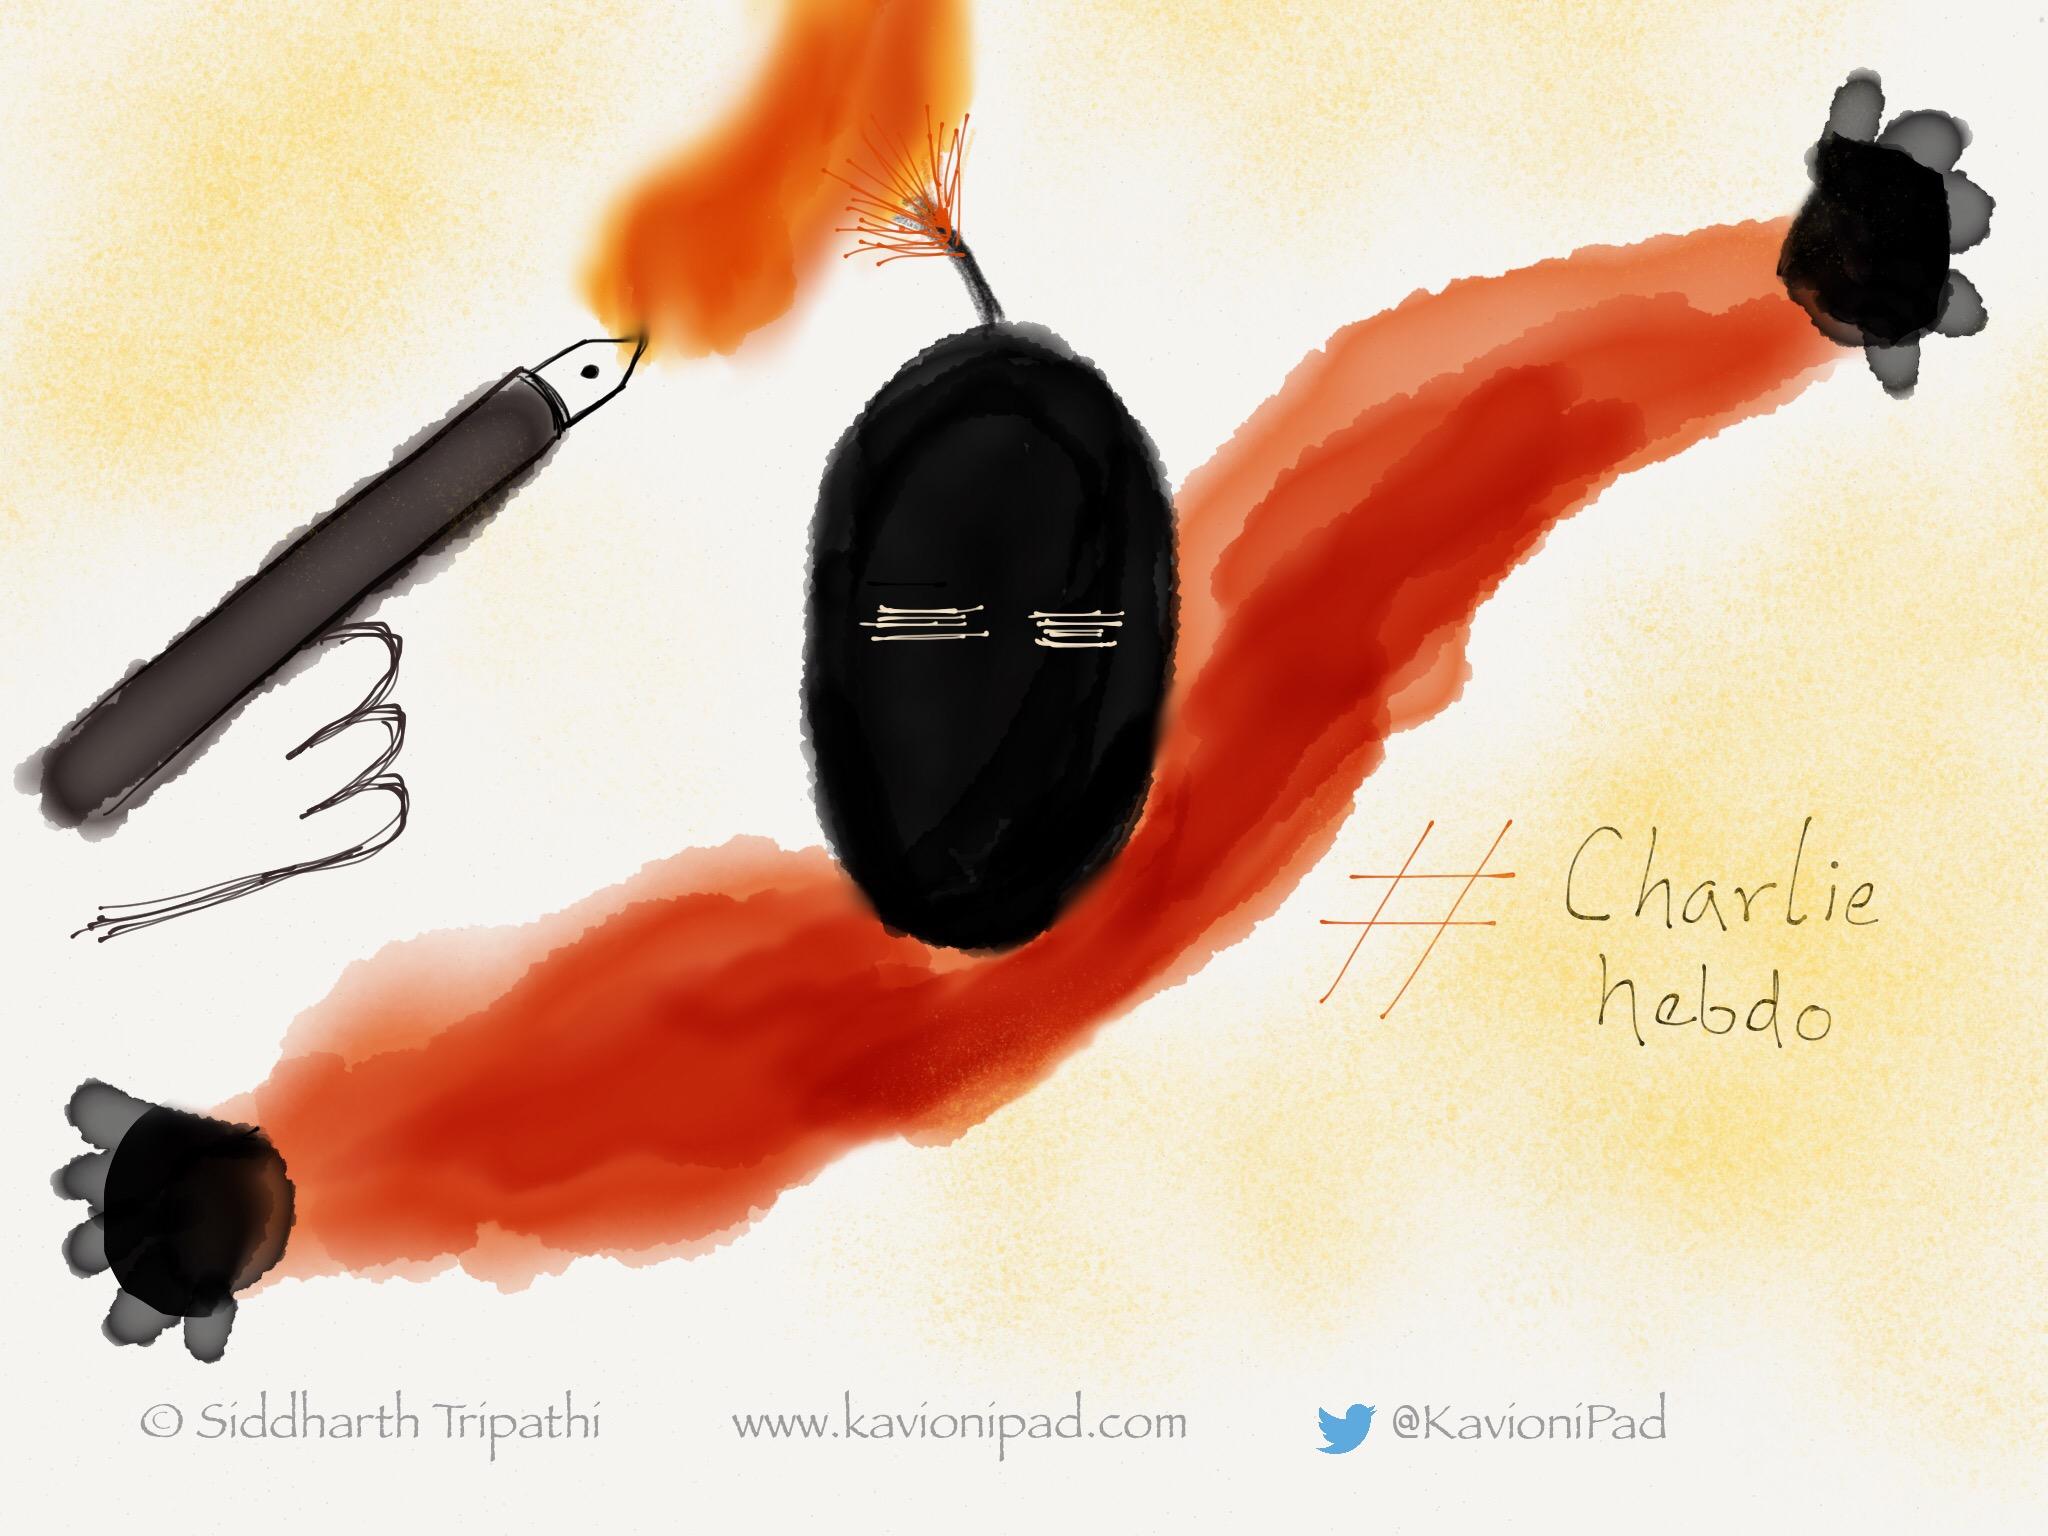 Fire of Pen can burn every fear, every terror#CharlieHebdo